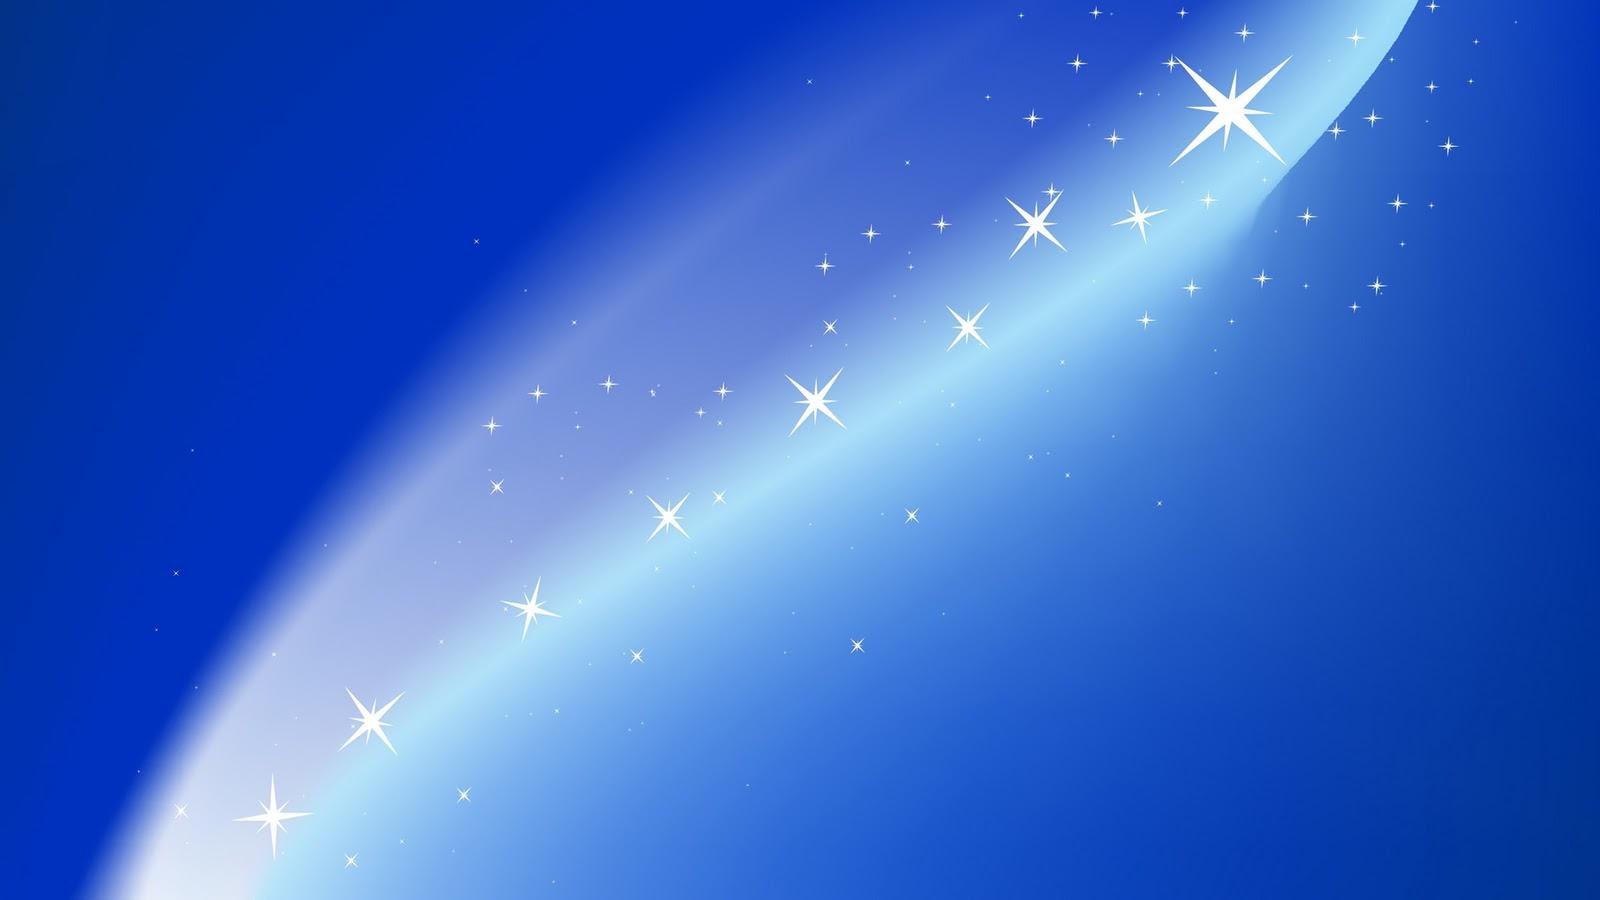 Best Vector Wallpapers Magic Blue Wallpaper